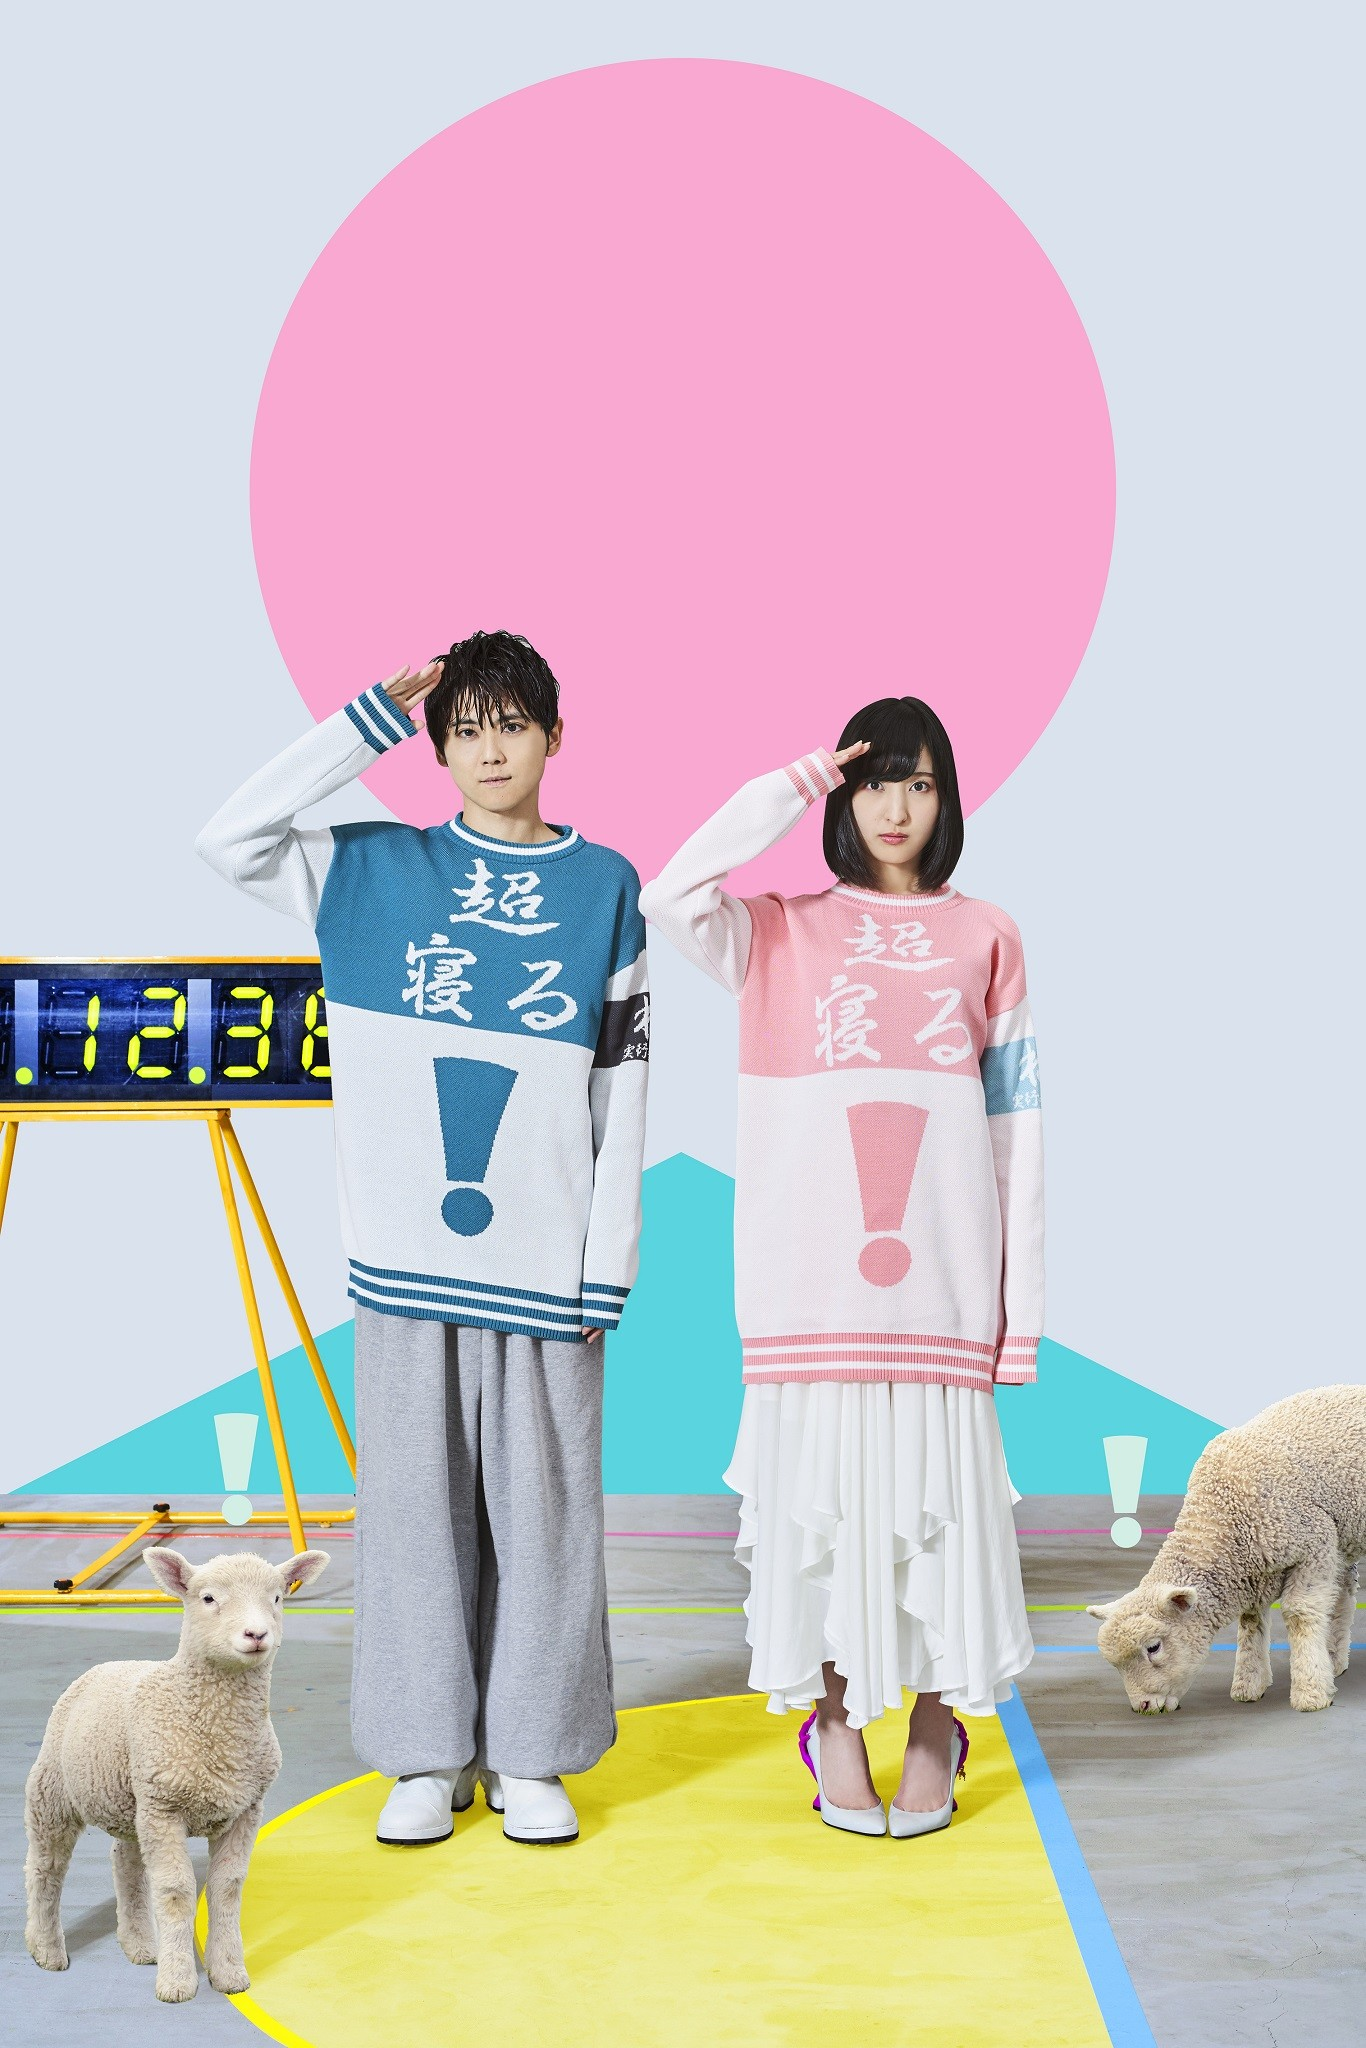 dd0bb9112ba82 声優の梶裕貴や佐倉綾音がハザマとコラボ、